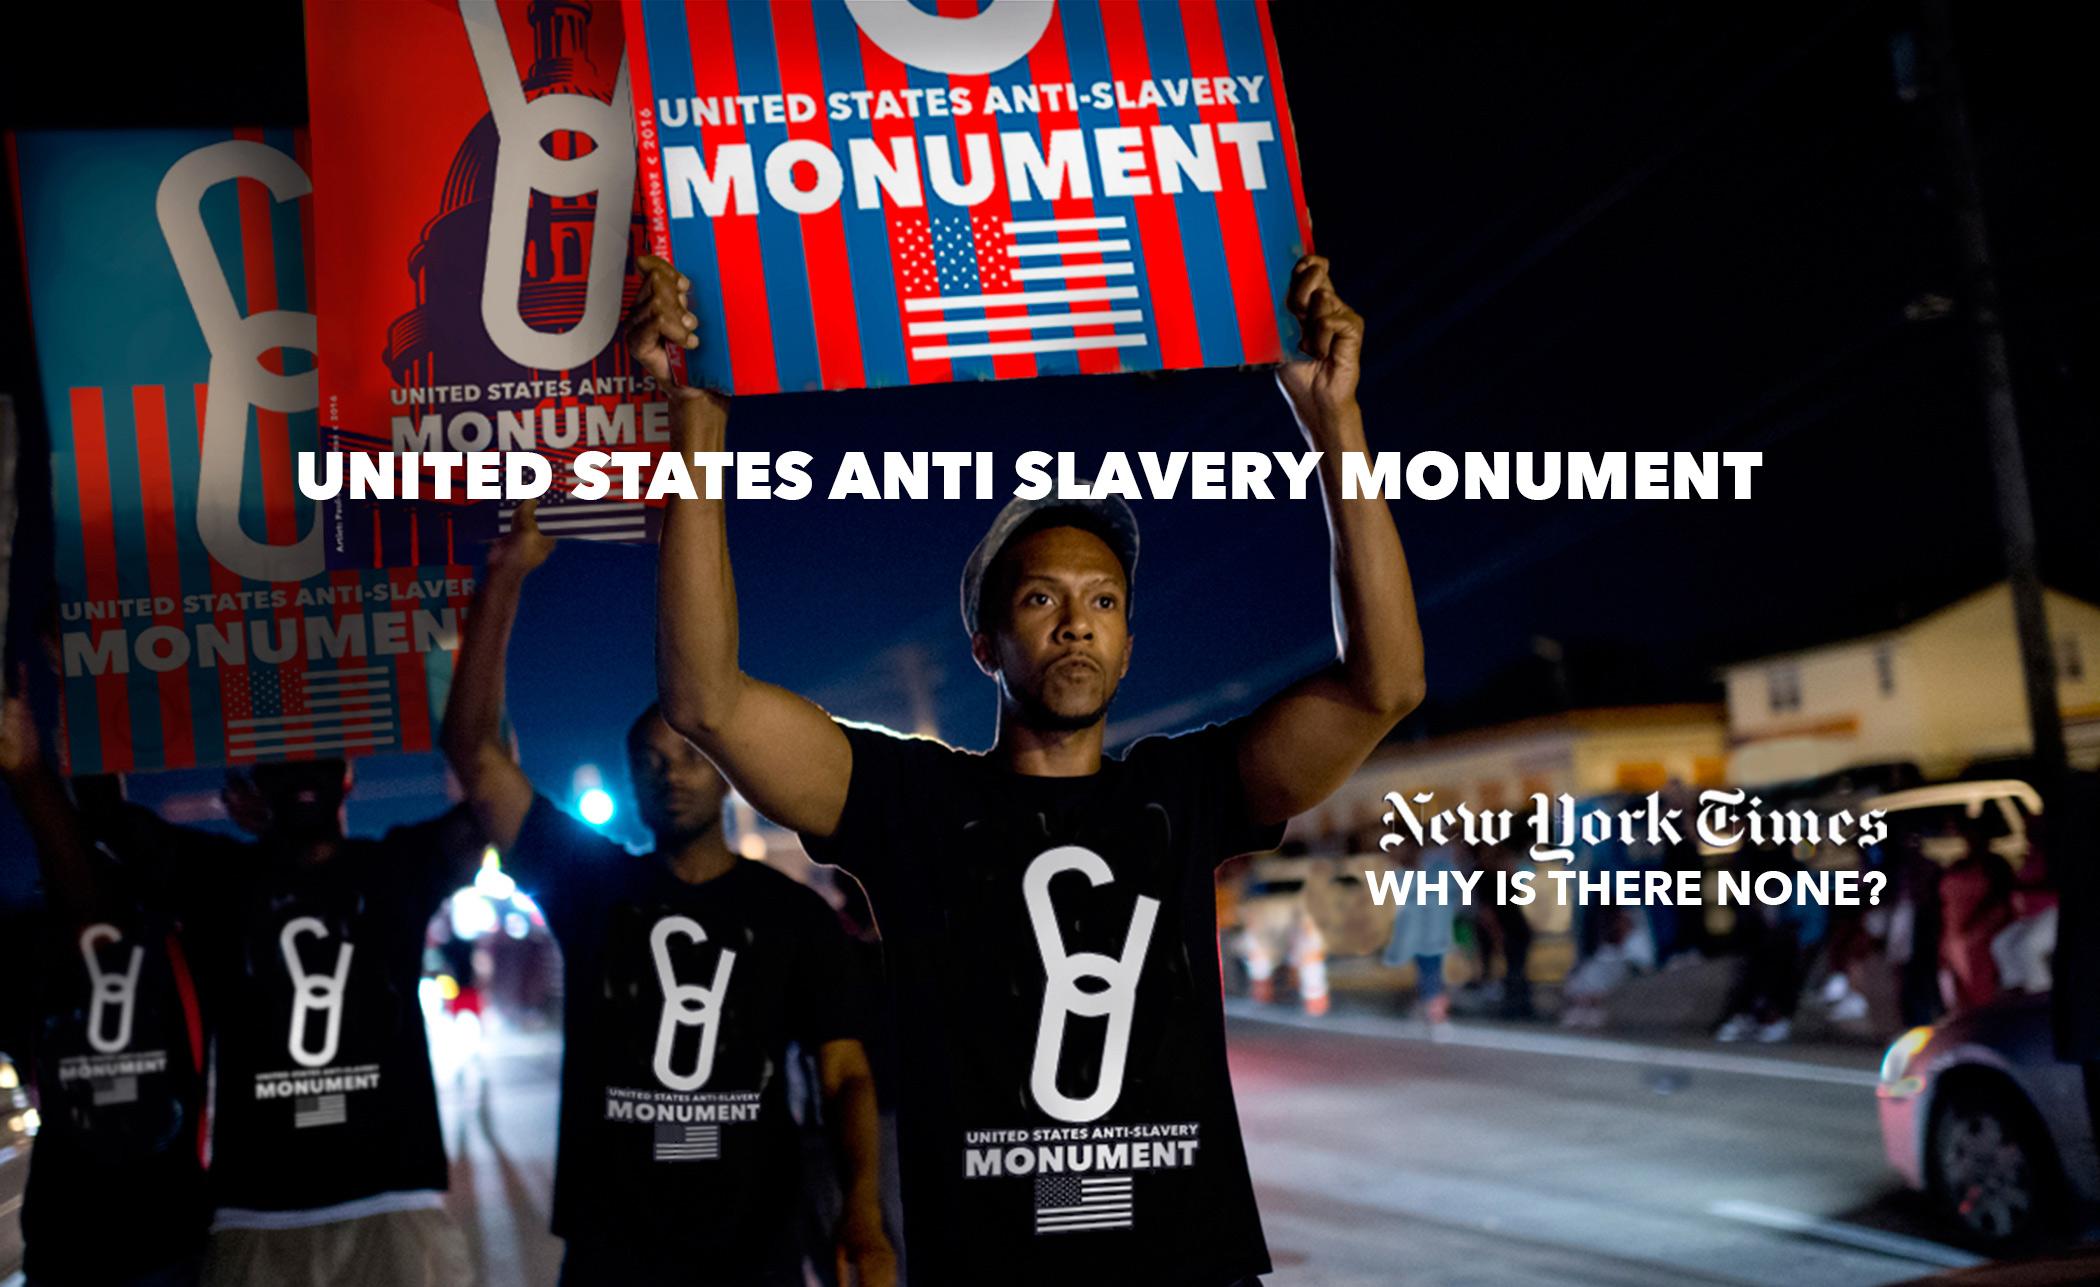 NATIONAL ANTI-SLAVERY, ANTI HUMAN TRAFFICKING MONUMENT